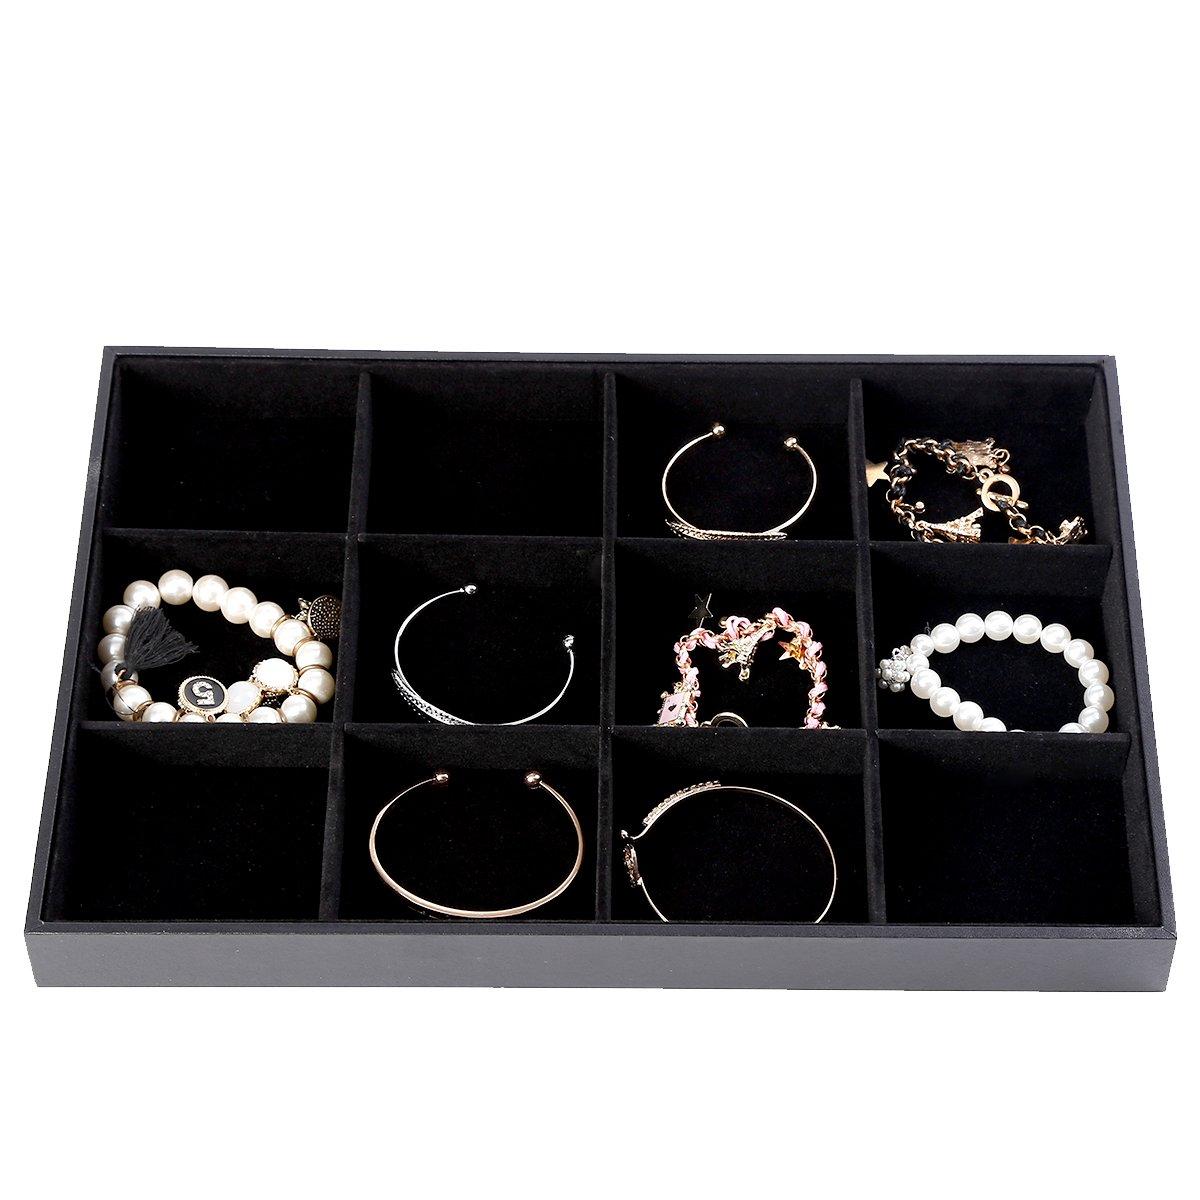 Soaptree Black Velvet 12 Grid Jewelry Tray Stackable Showcase Display Organizer , 1 Piece(12 Grid Jewelry Tray)